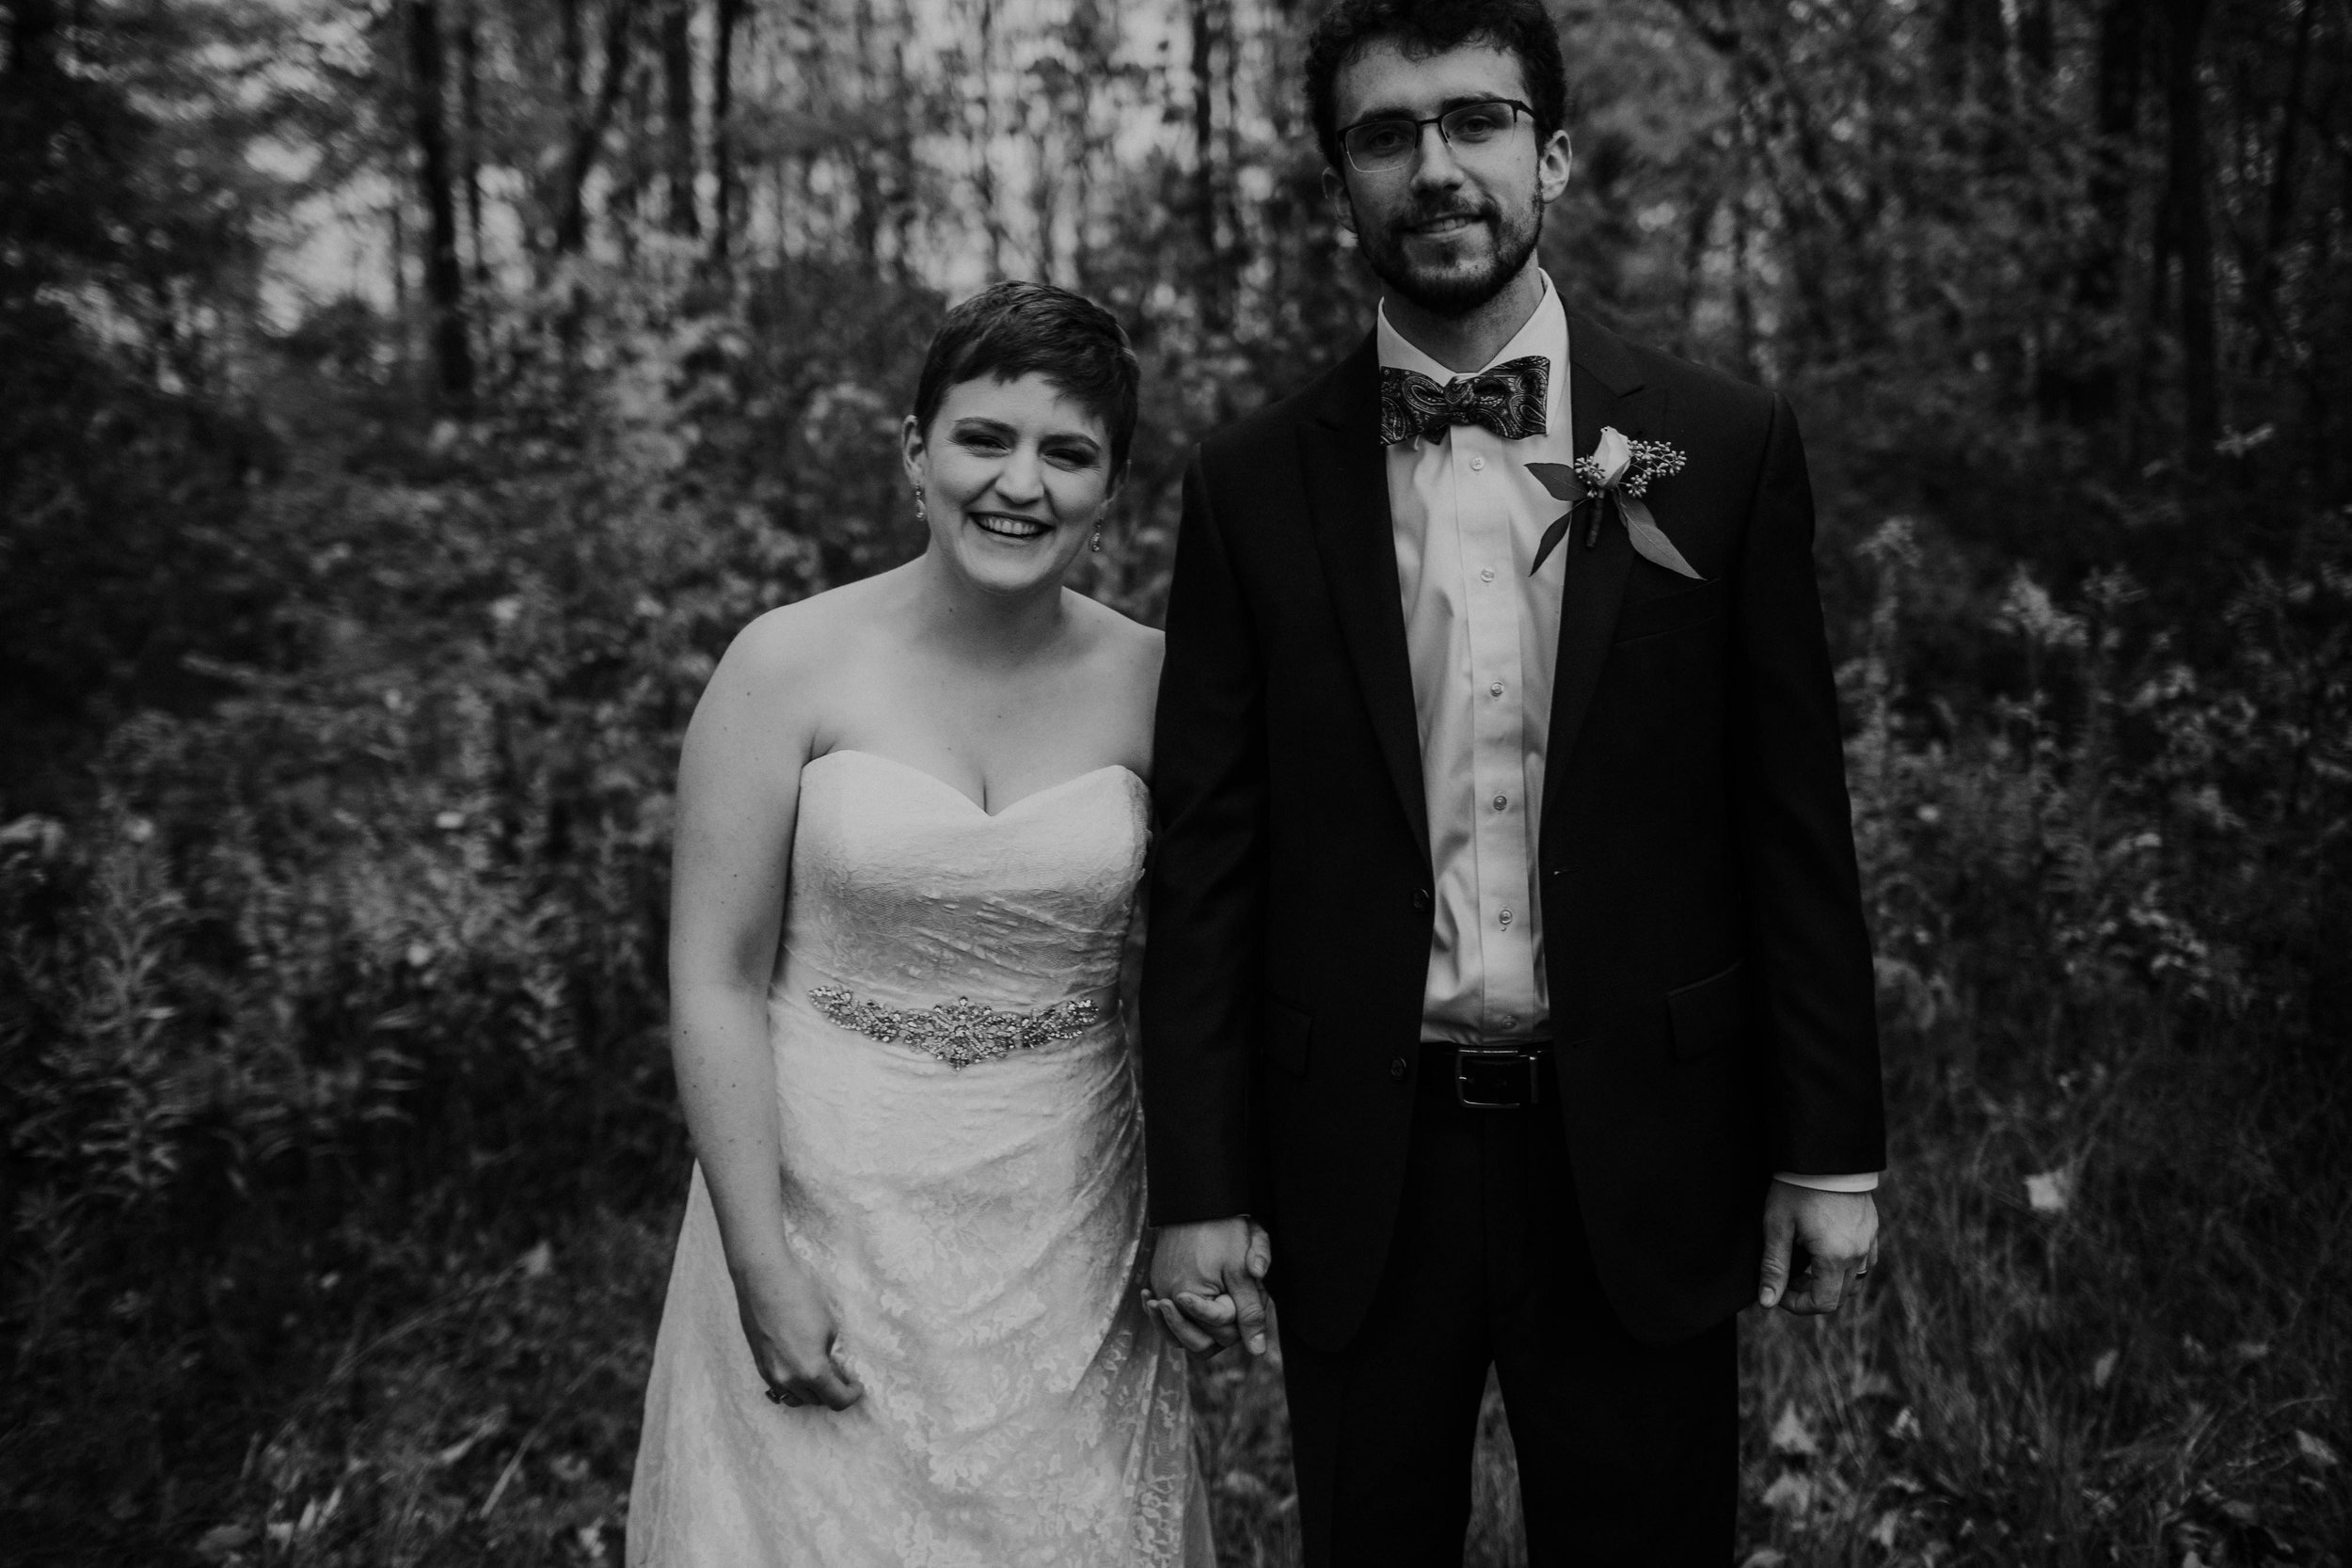 Columbus ohio wedding photographer grace e jones photography real fun joyful wedding61.jpg